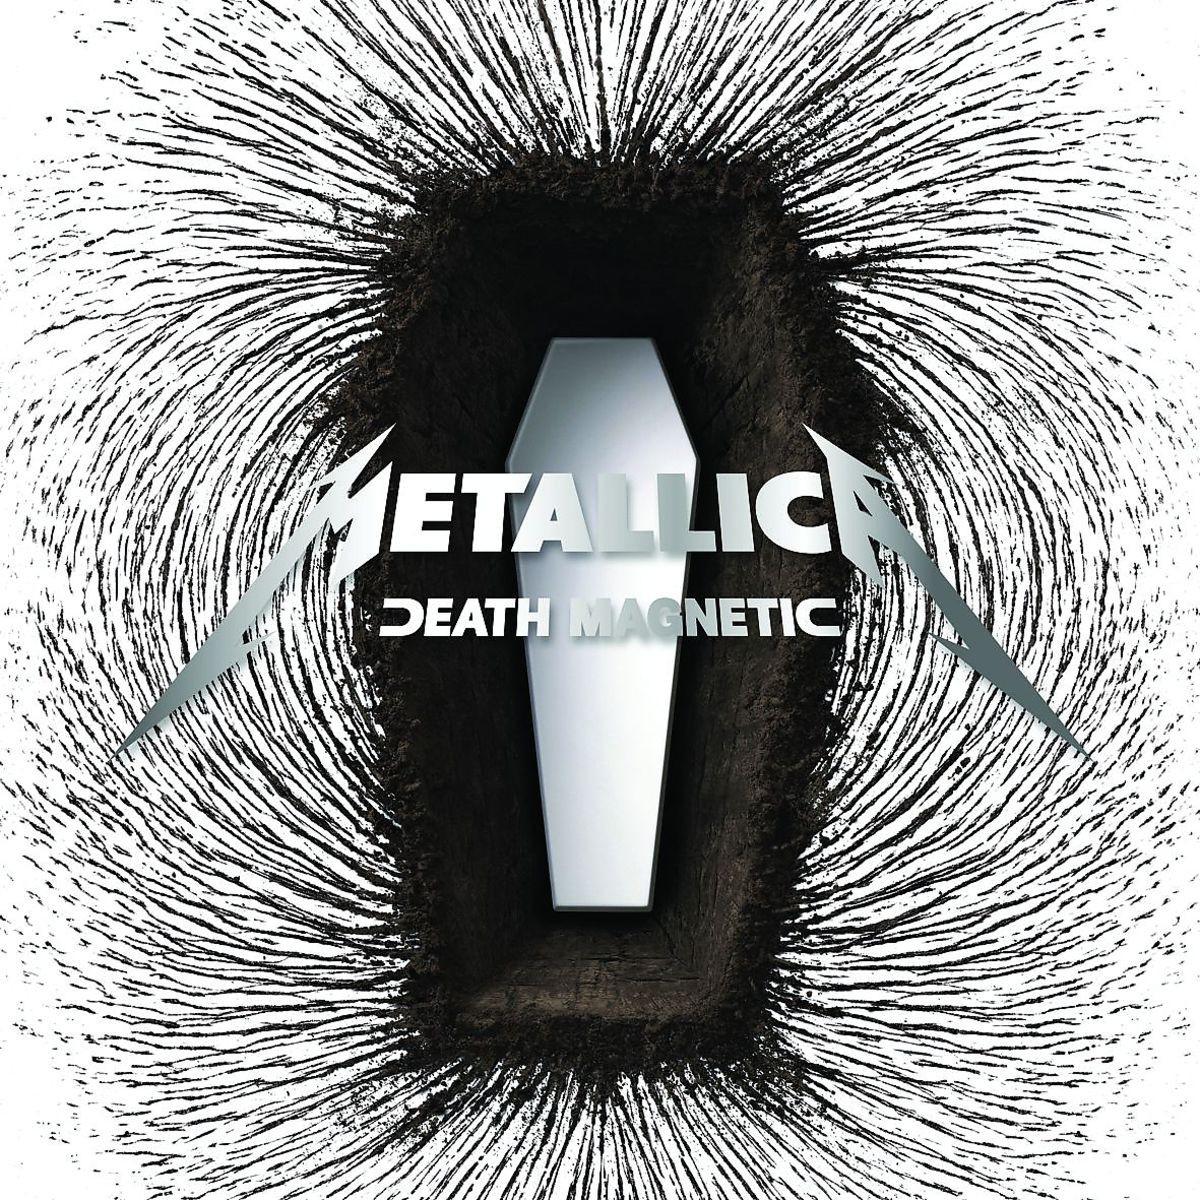 Metallica-Death Magnetic